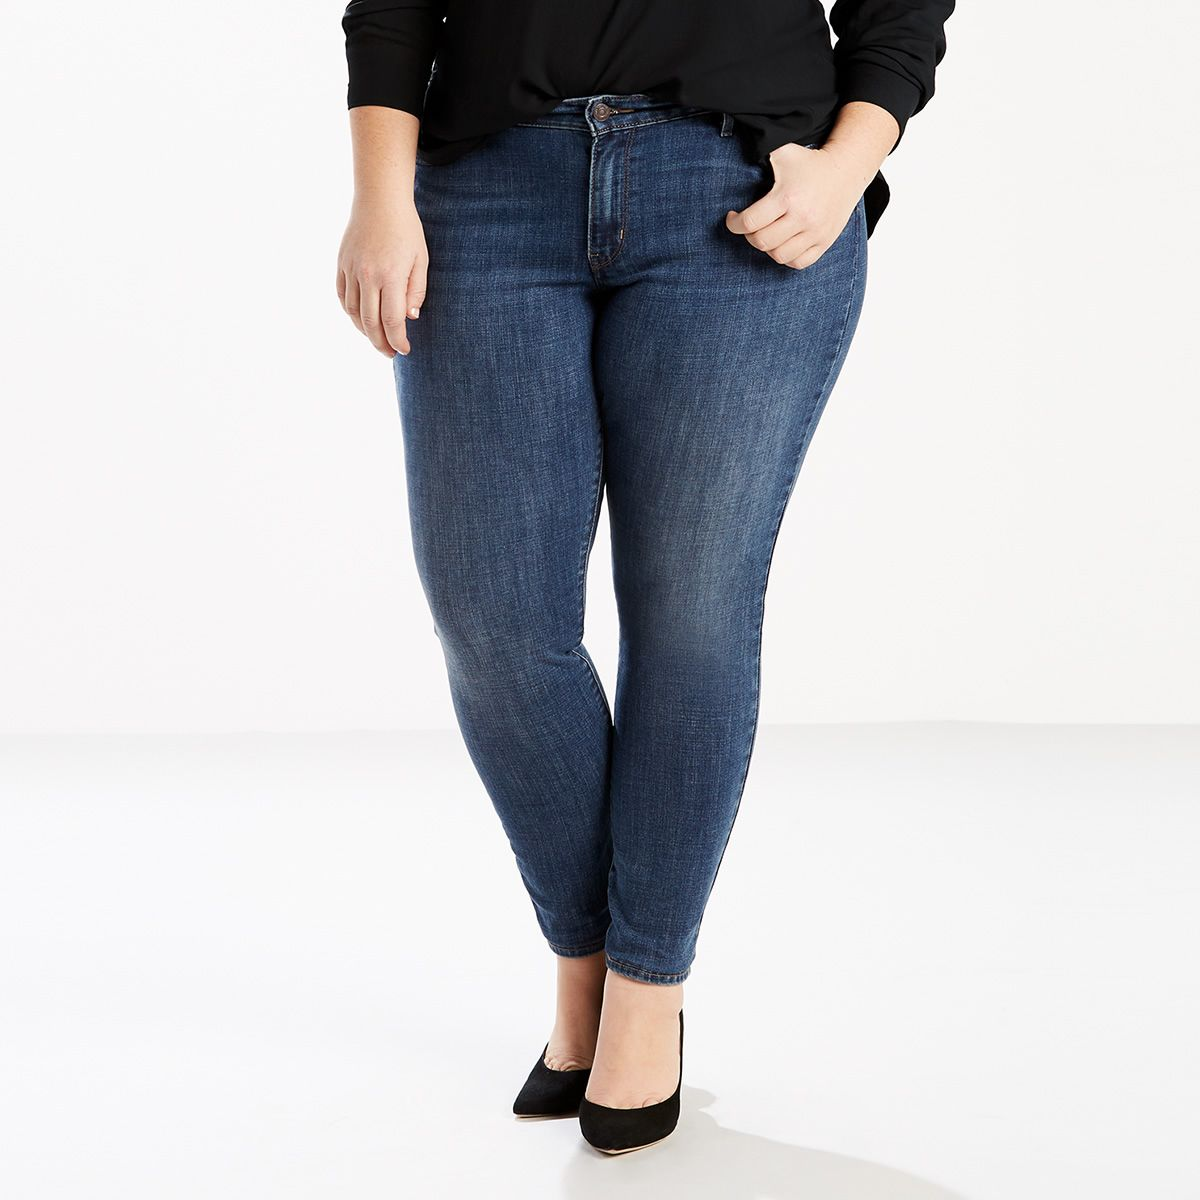 5b057865a20a Womens Levis Jeans   Denim Apparel - Macy s